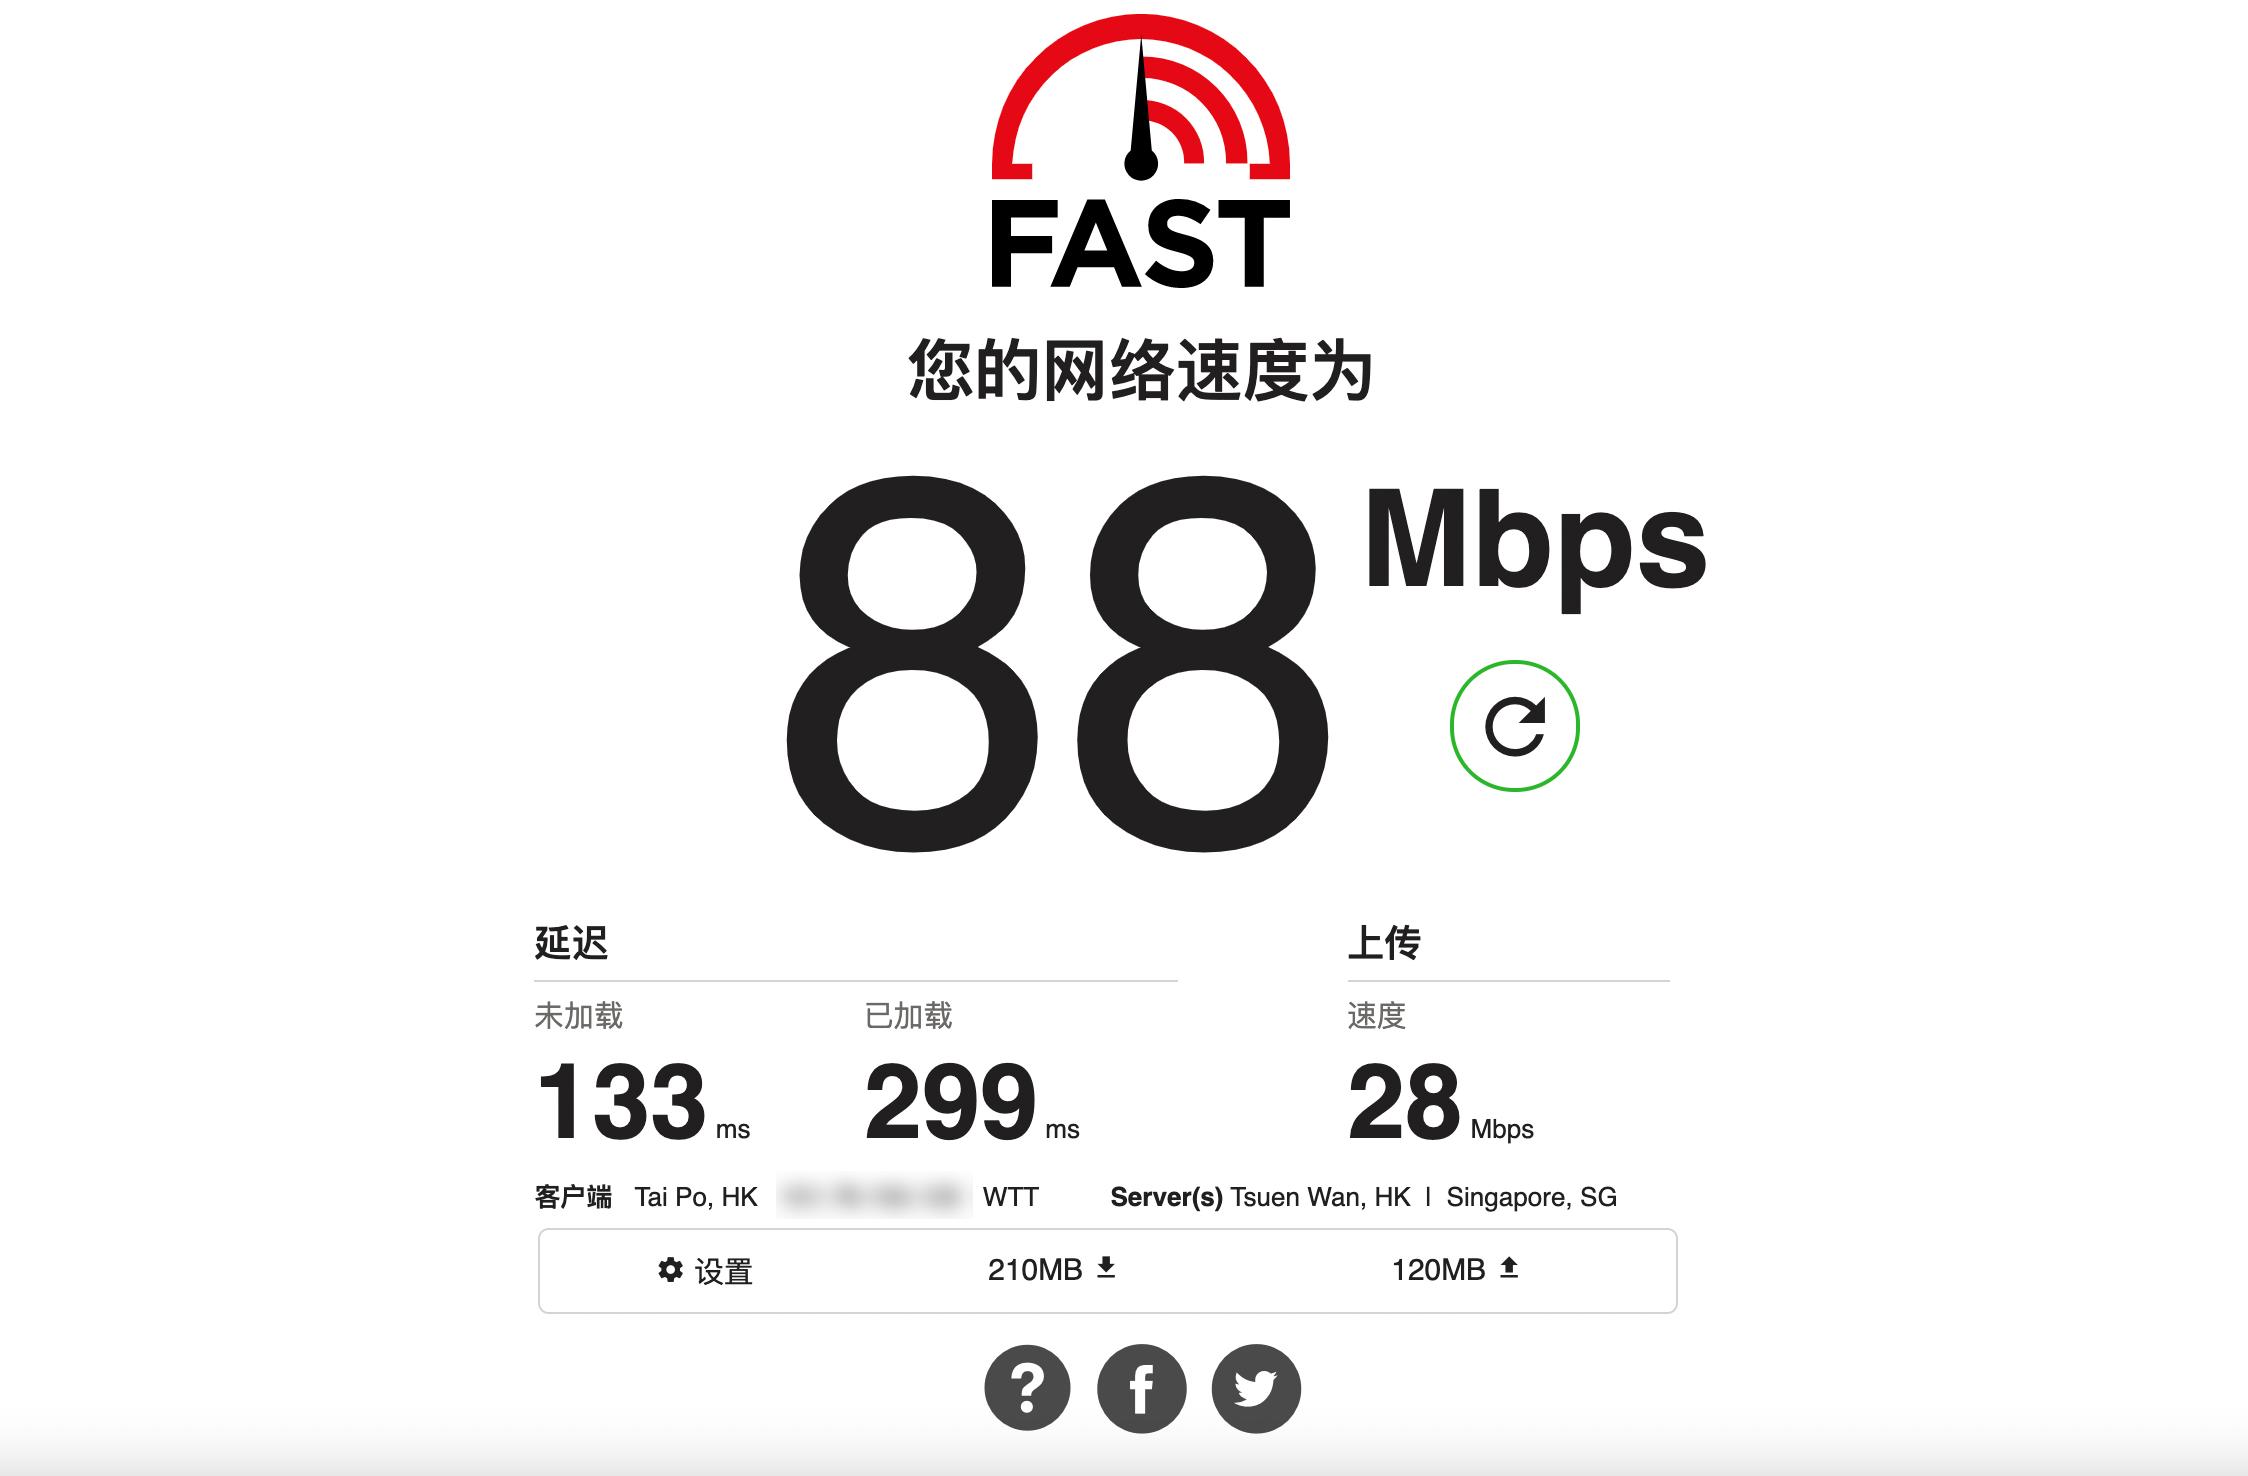 在线测速 - fast.png